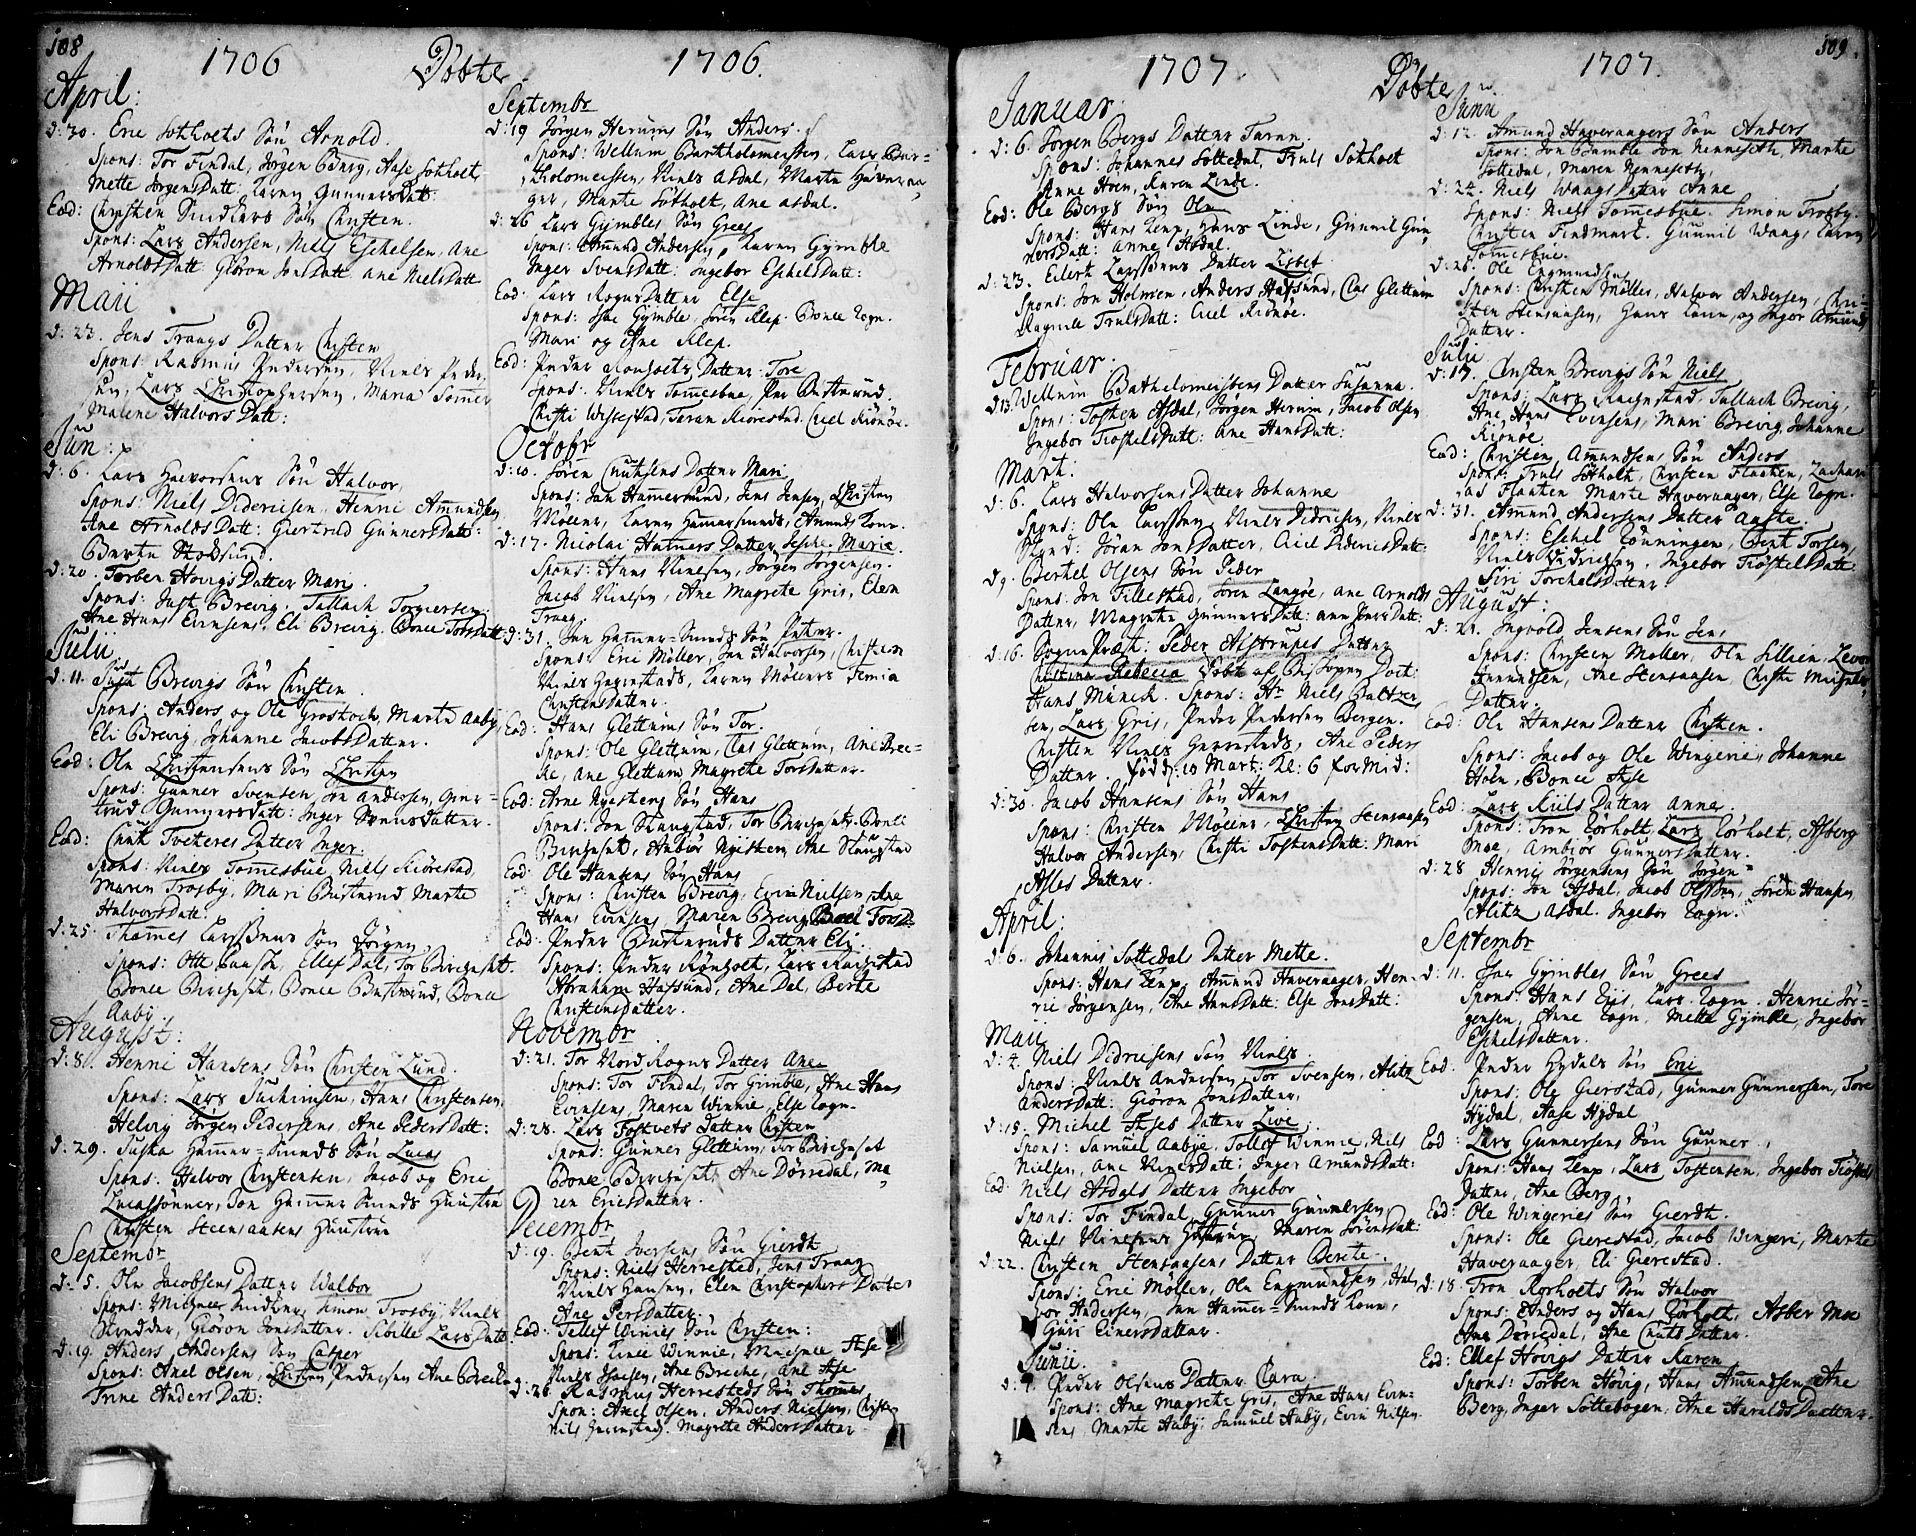 SAKO, Bamble kirkebøker, F/Fa/L0001: Ministerialbok nr. I 1, 1702-1774, s. 108-109